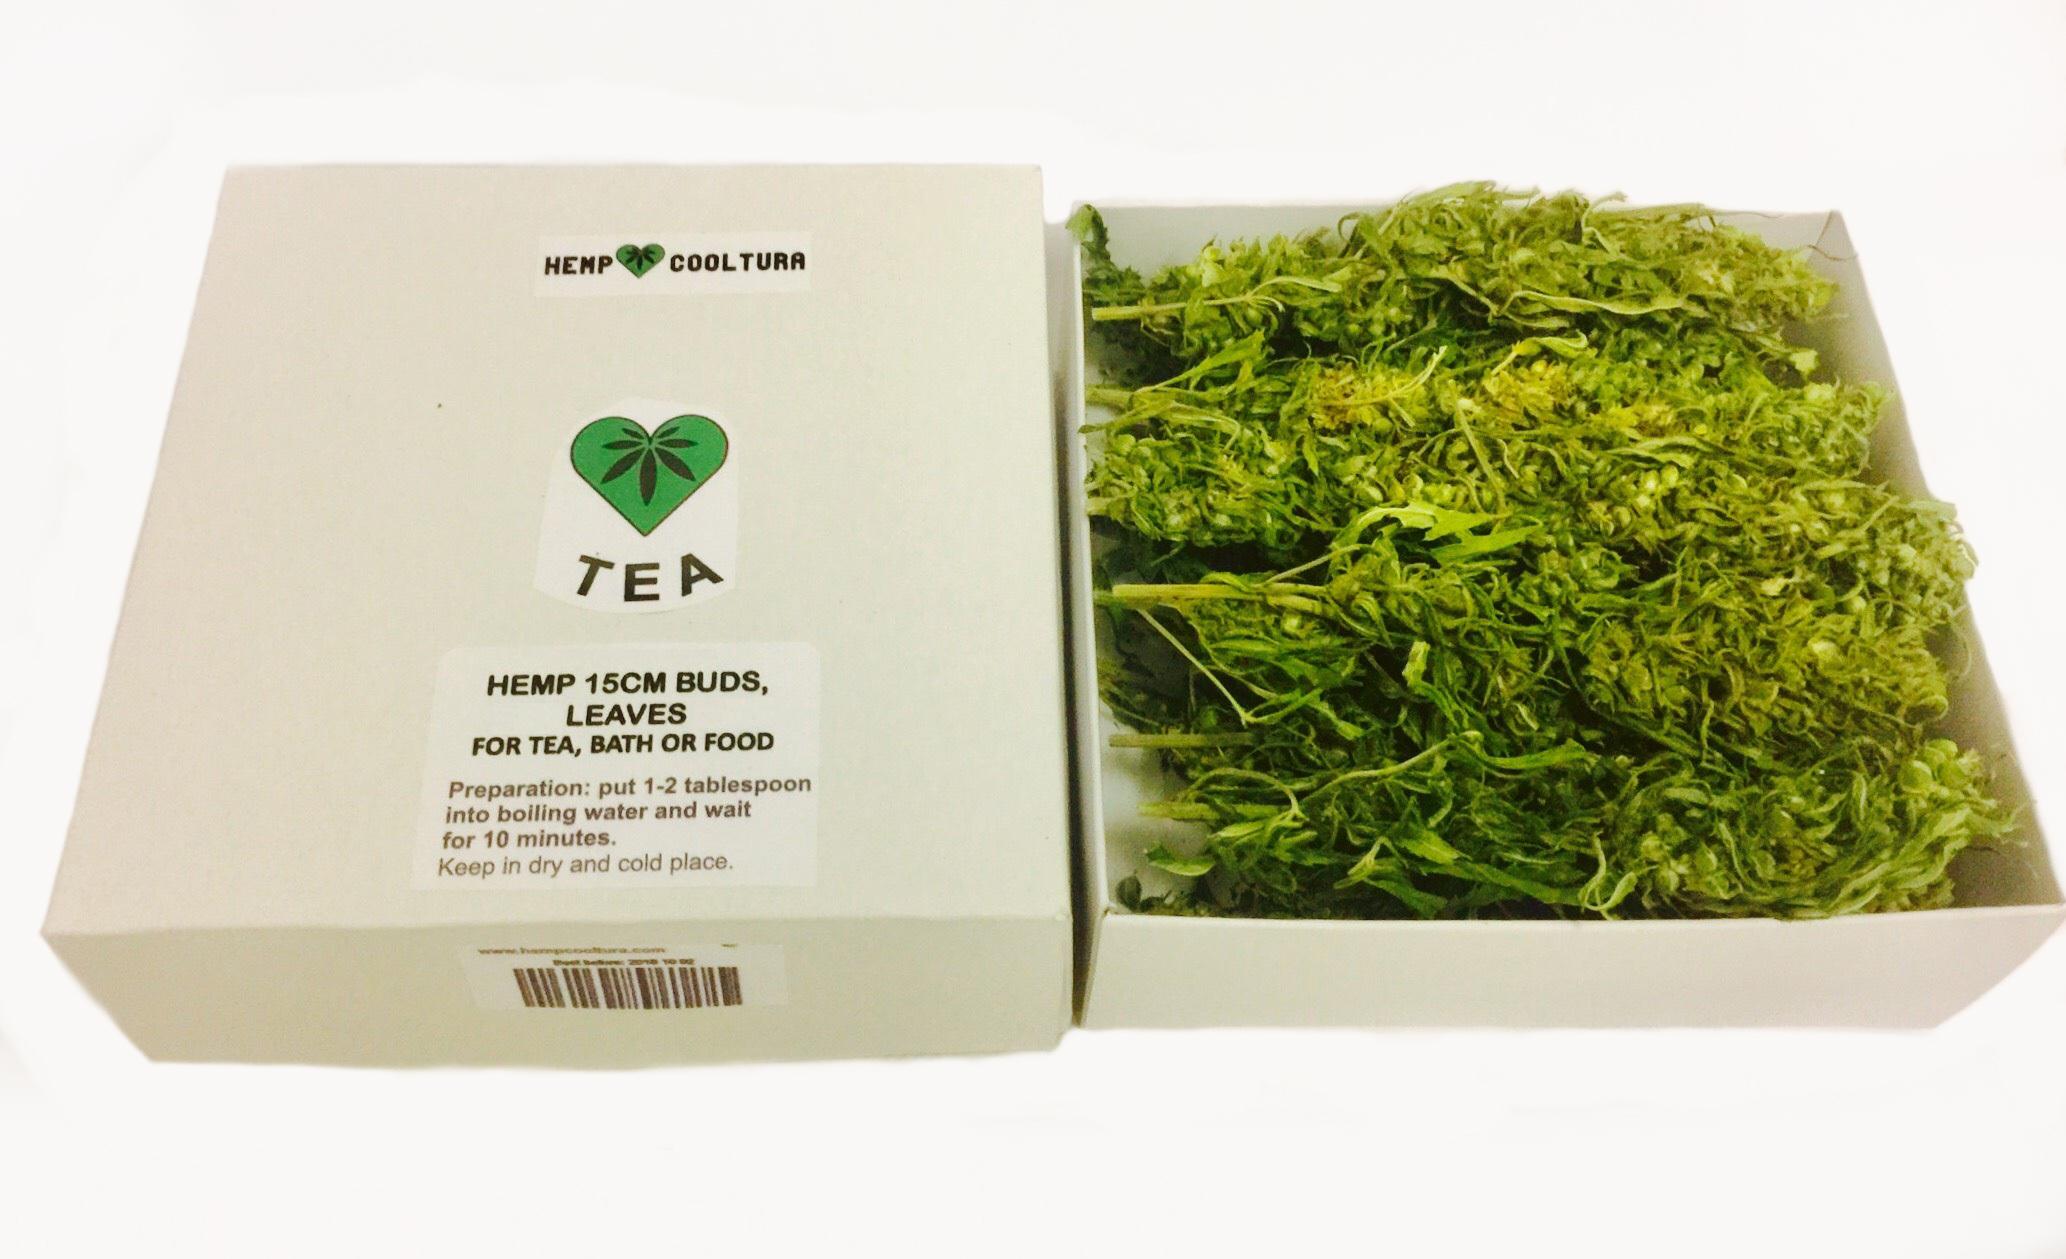 Hemp tea 15cm long whole buds 60g